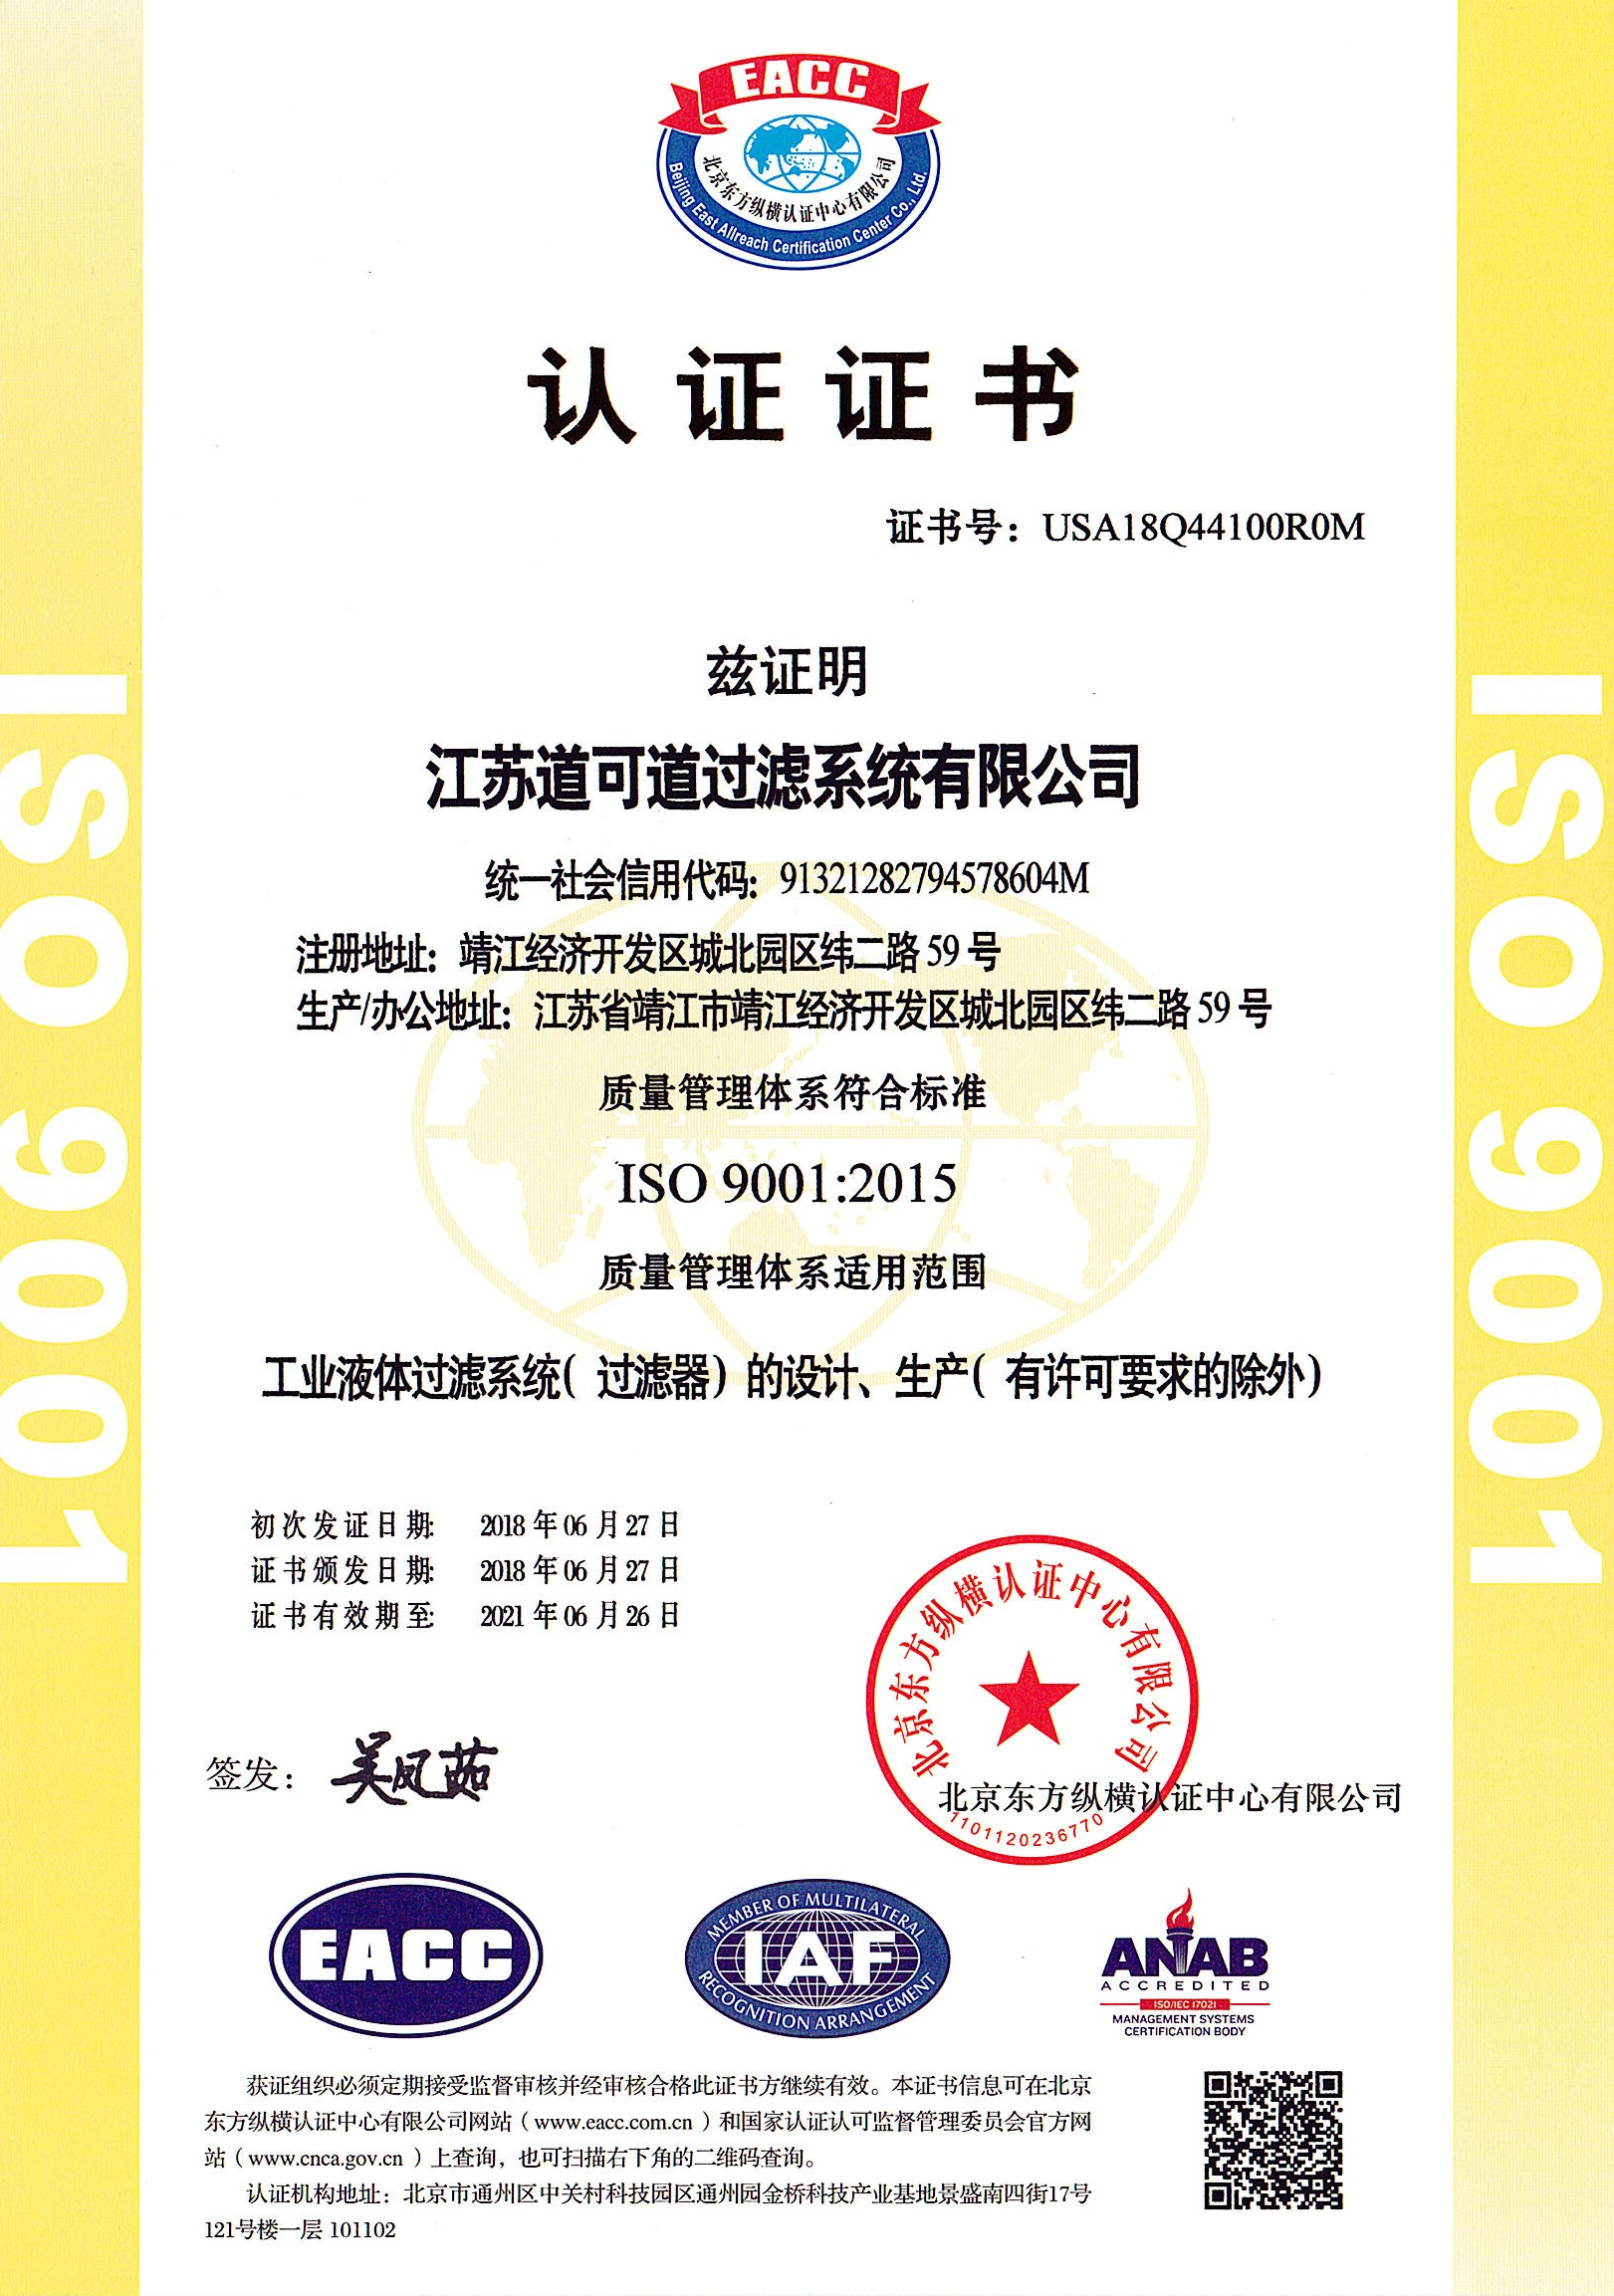 道可道ISO9001质量体系认证